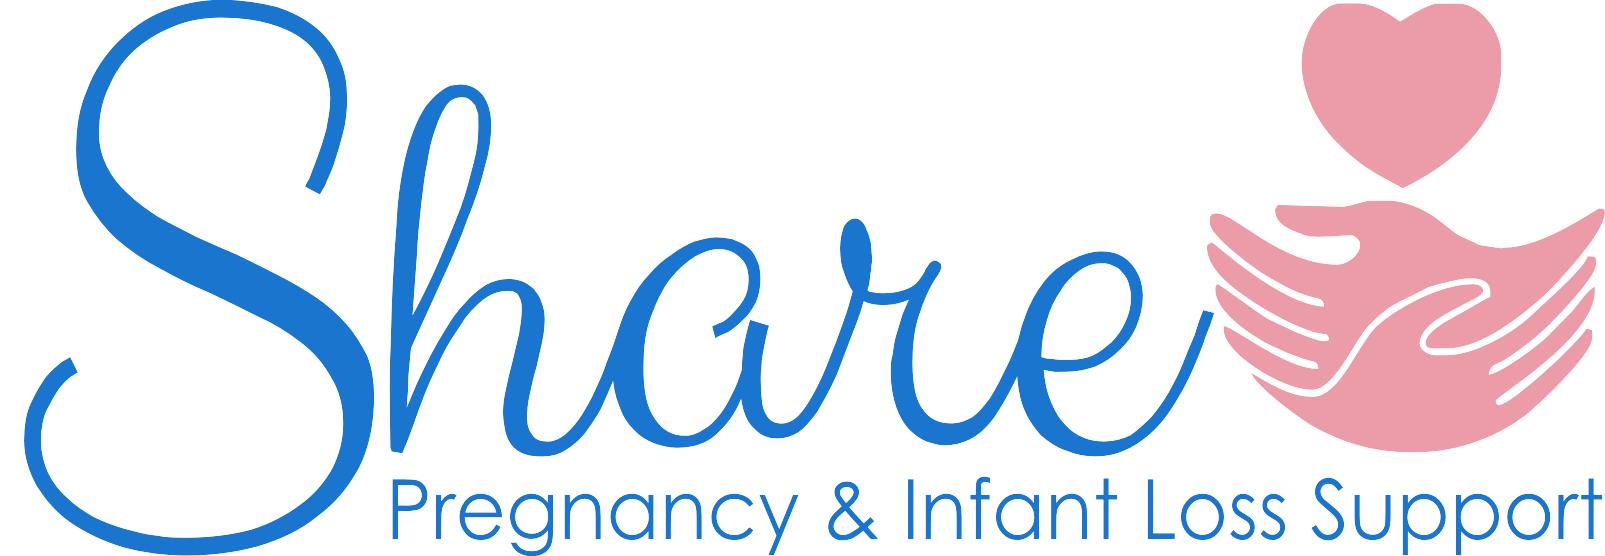 Share Logo-Color